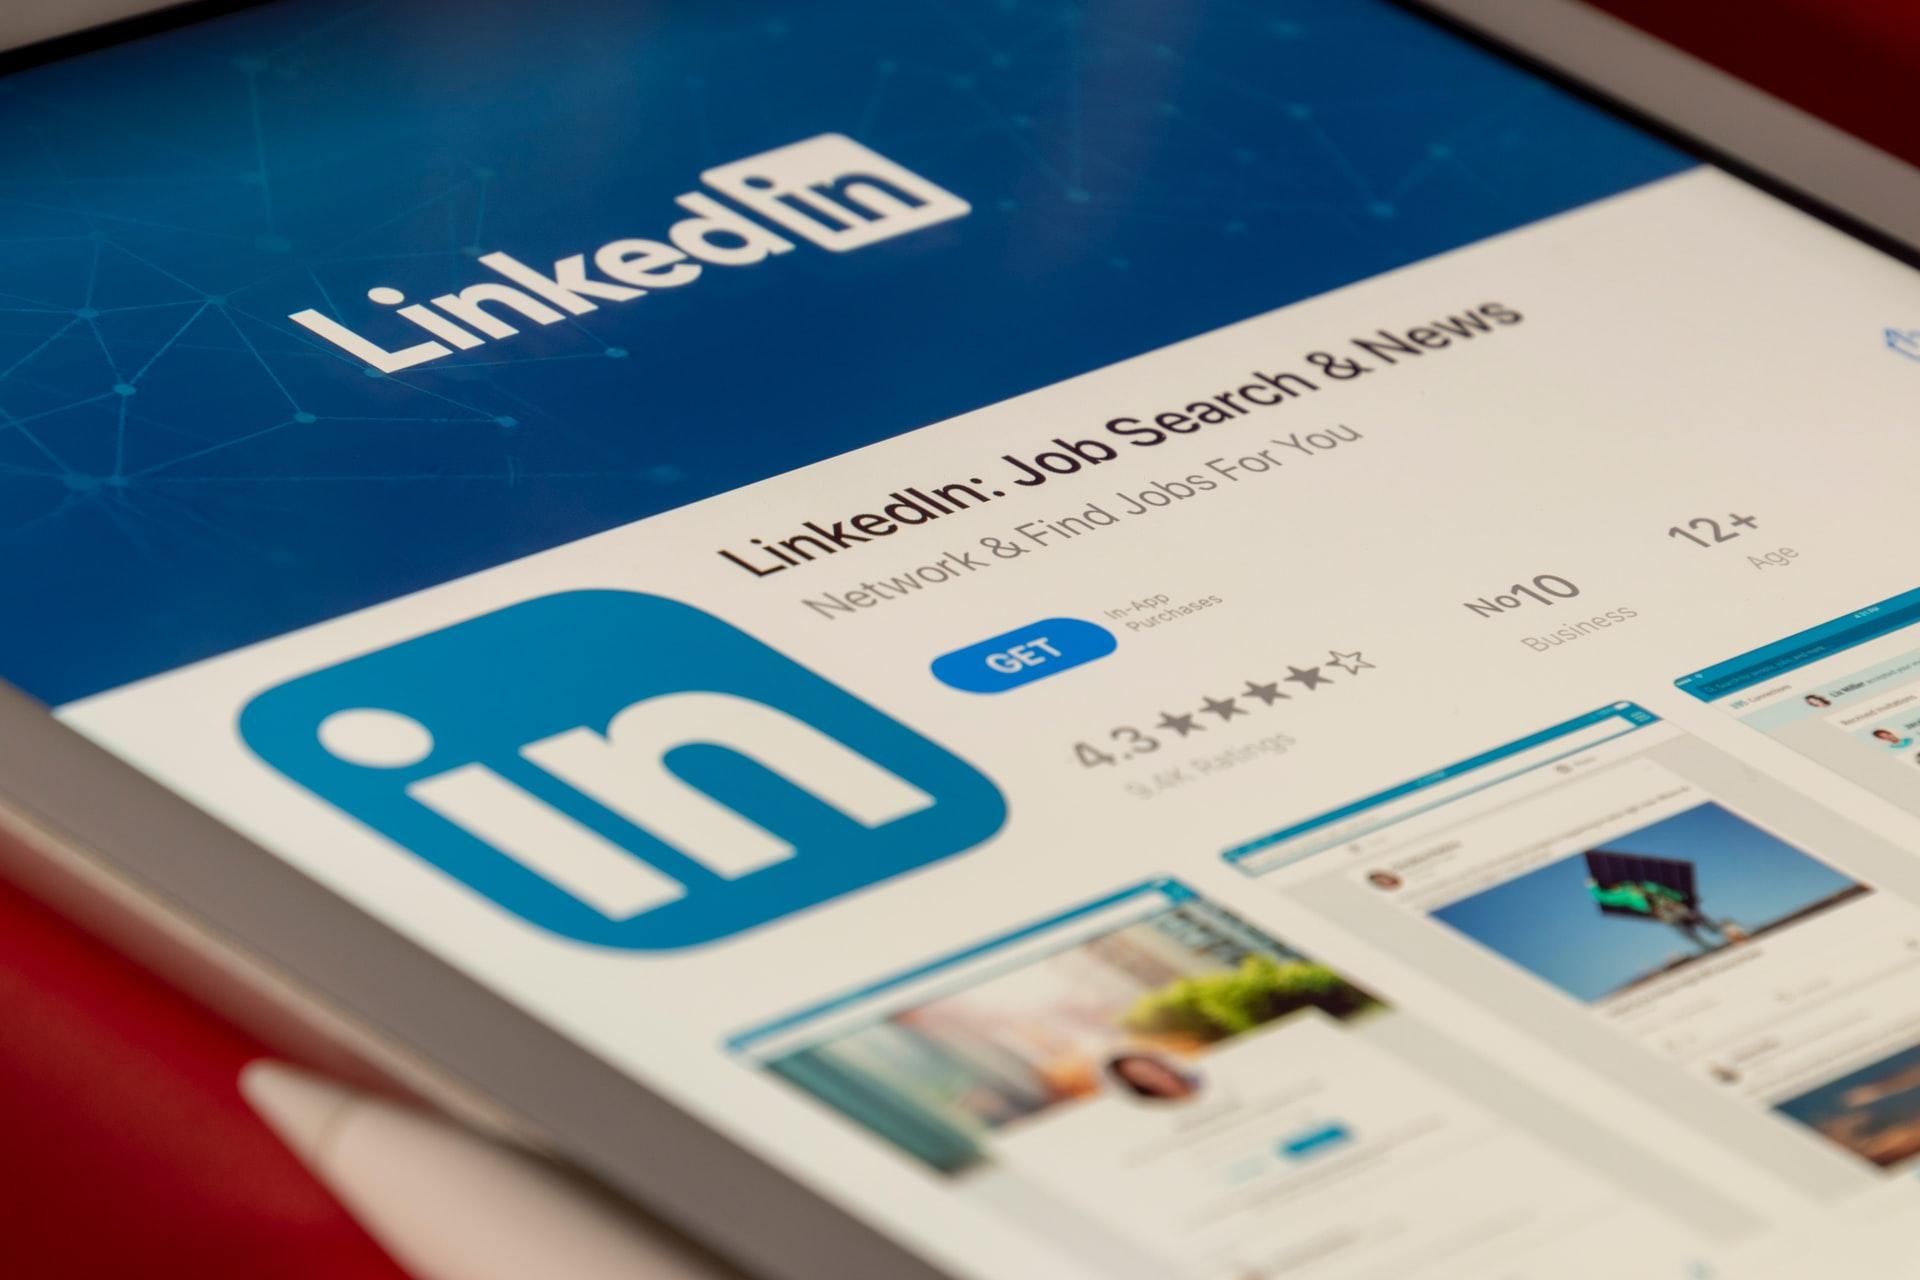 Skyfall Blue Digital Marketing Increase Your ROI from LinkedIn Ads